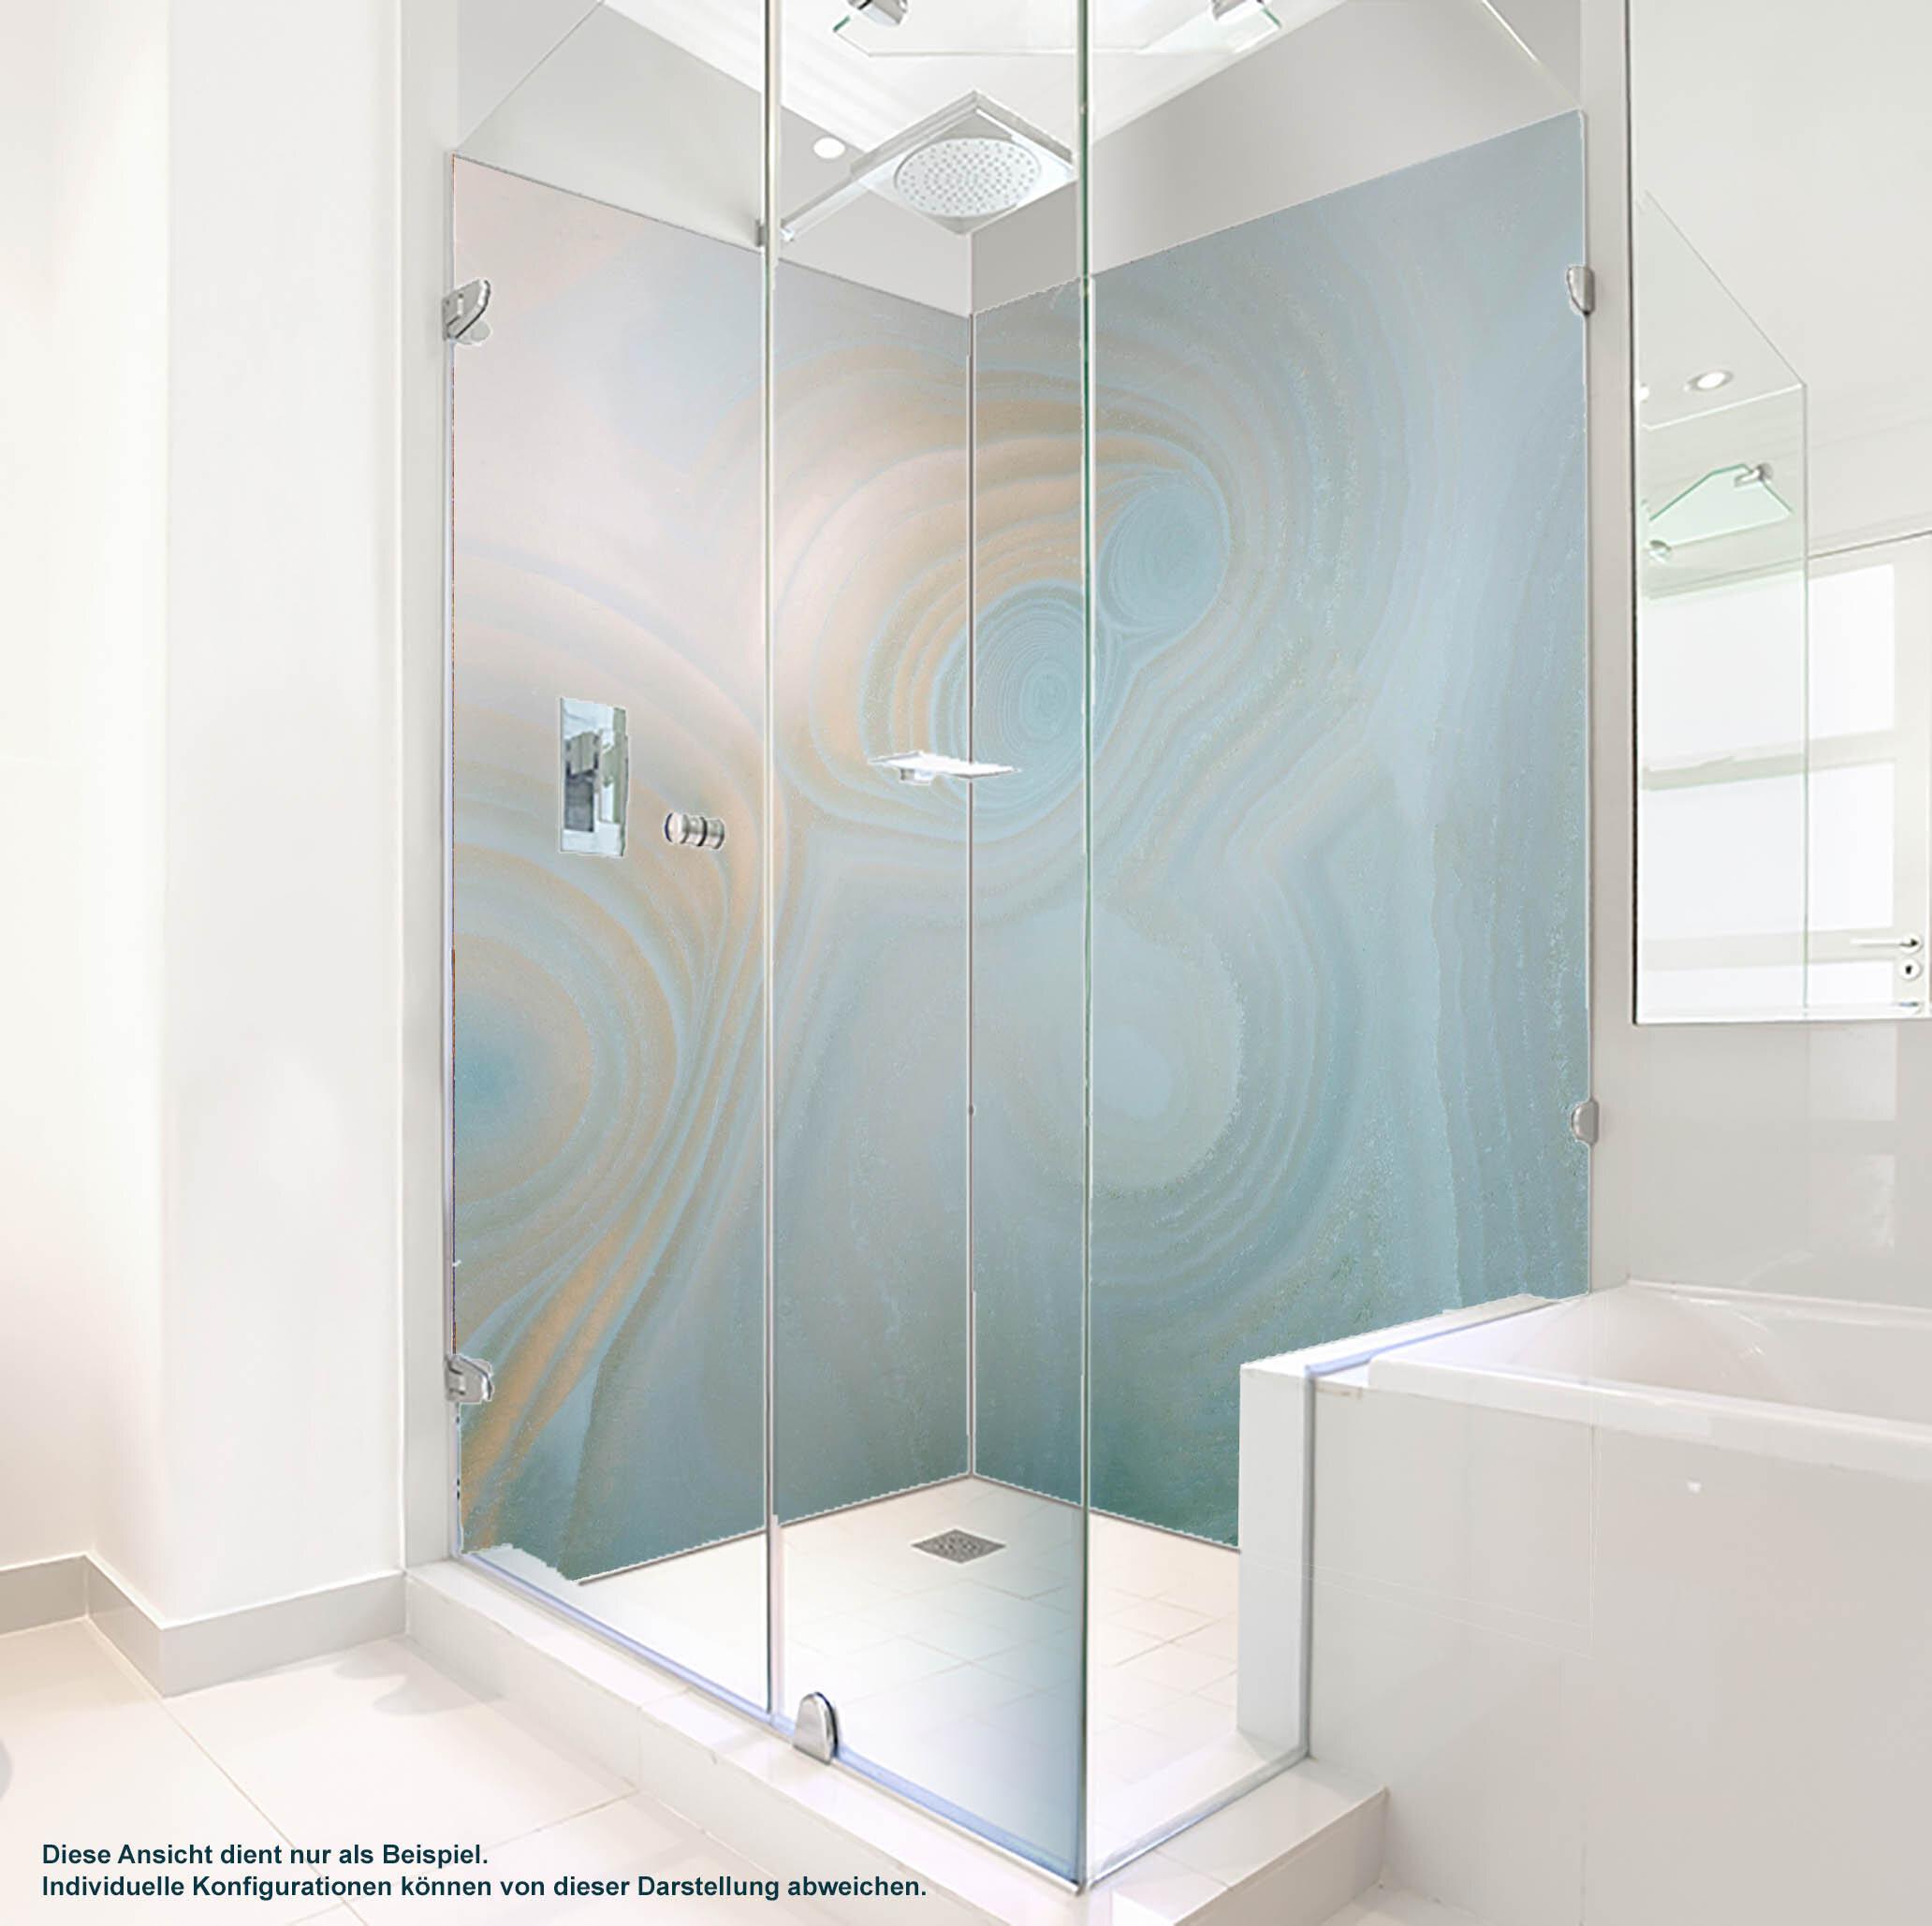 Dusche PlateART Duschrückwand mit Motiv Achat Hellblau